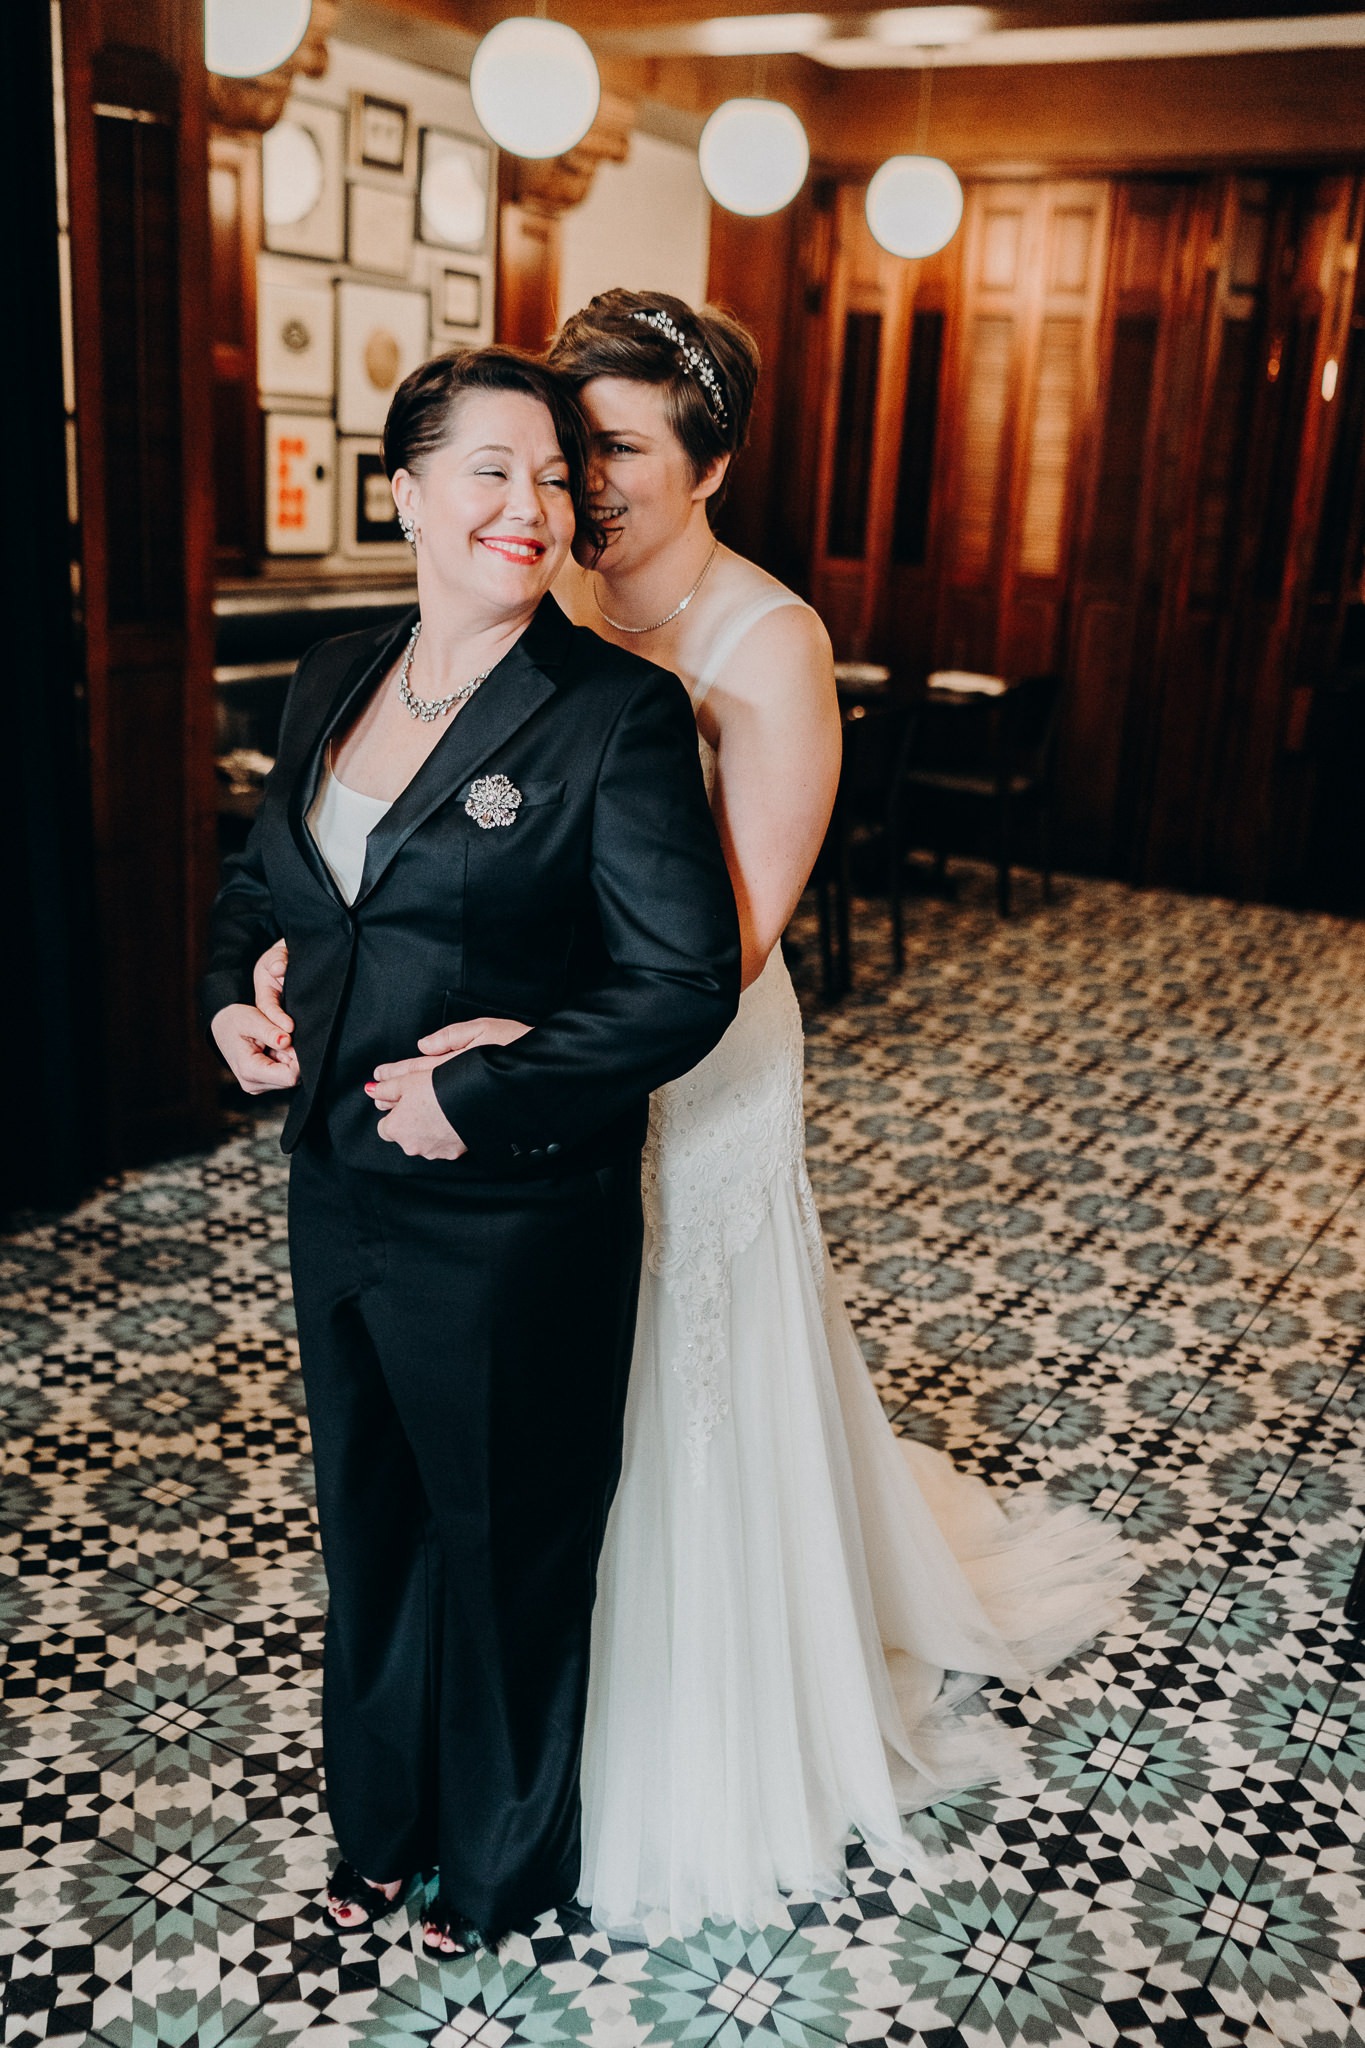 Seattle Hotel Lesbian Wedding First Look